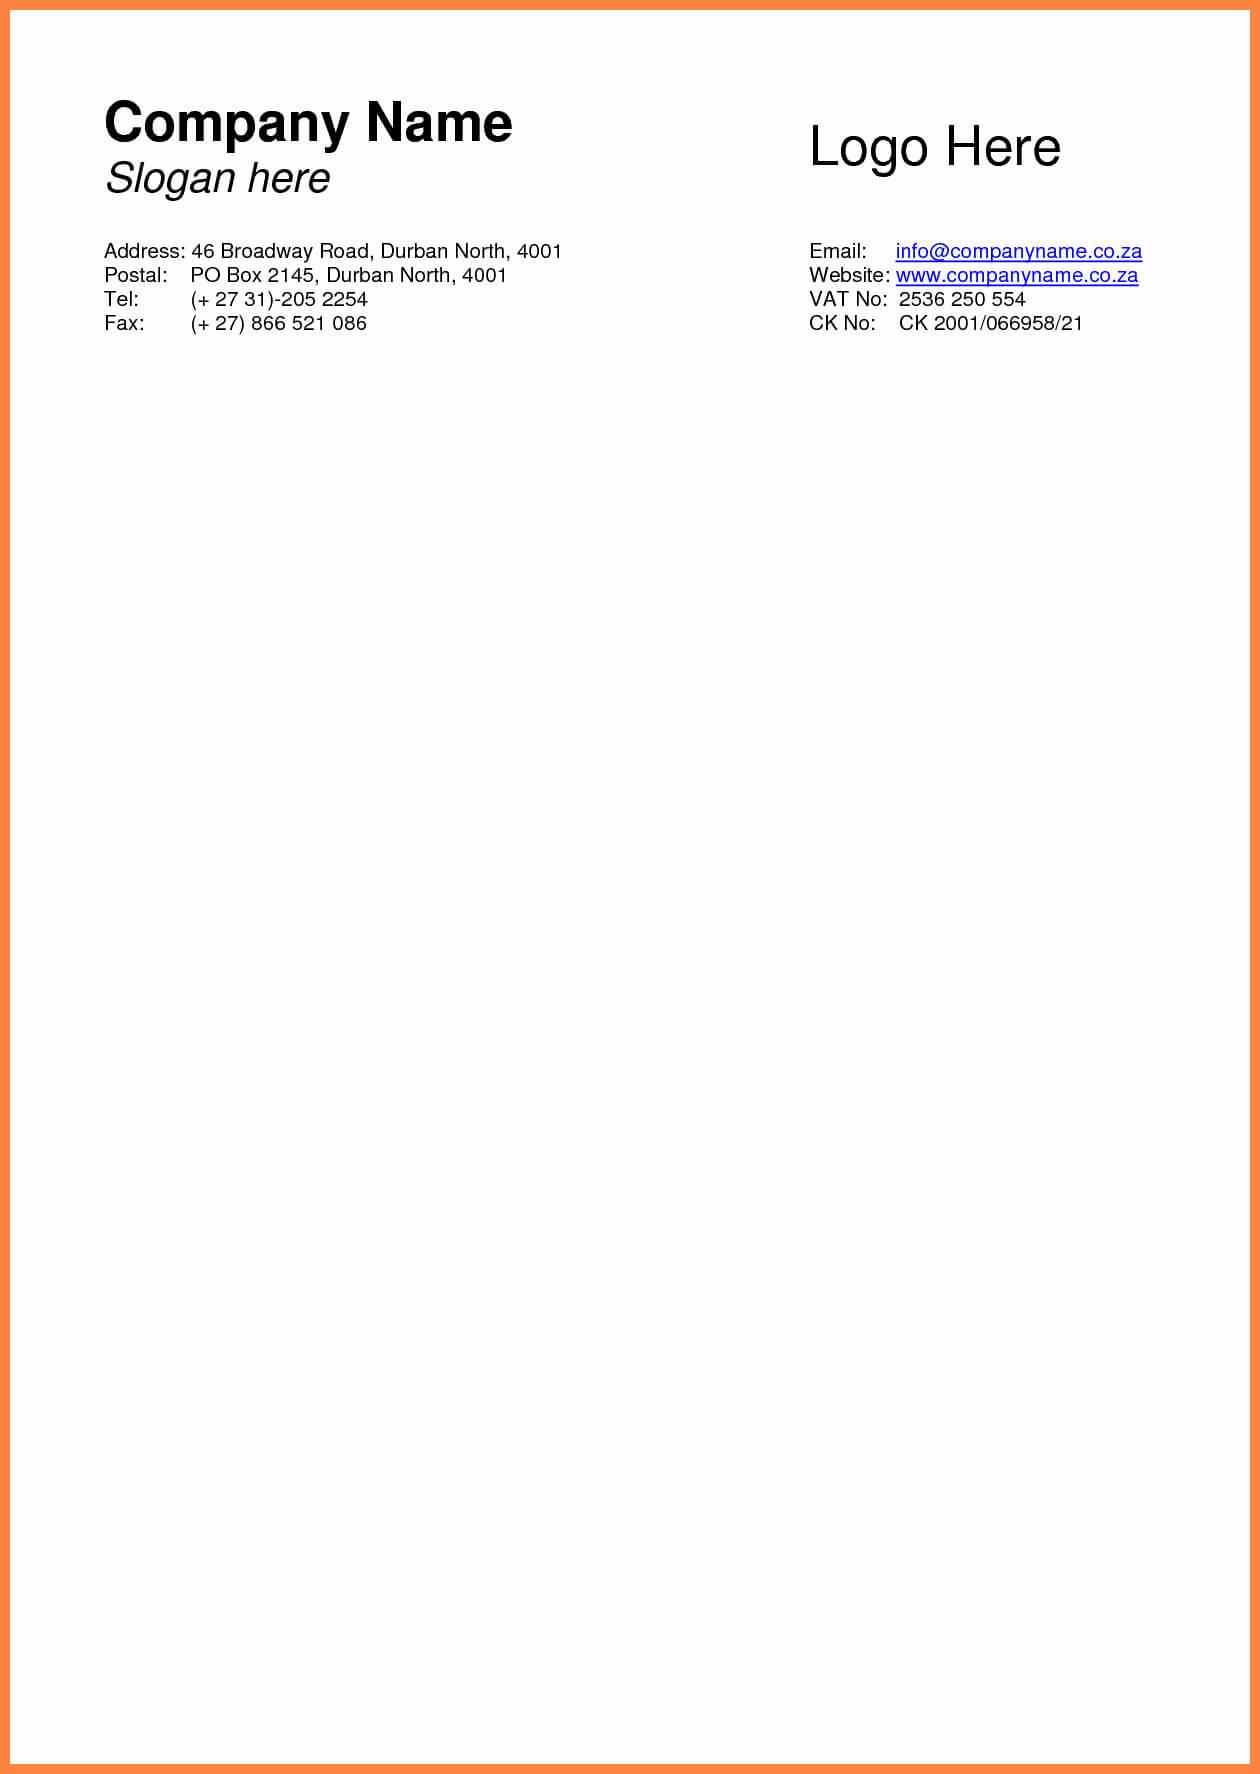 Business Letterhead Template Word Letter Sample Templates within Headed Letter Template Word